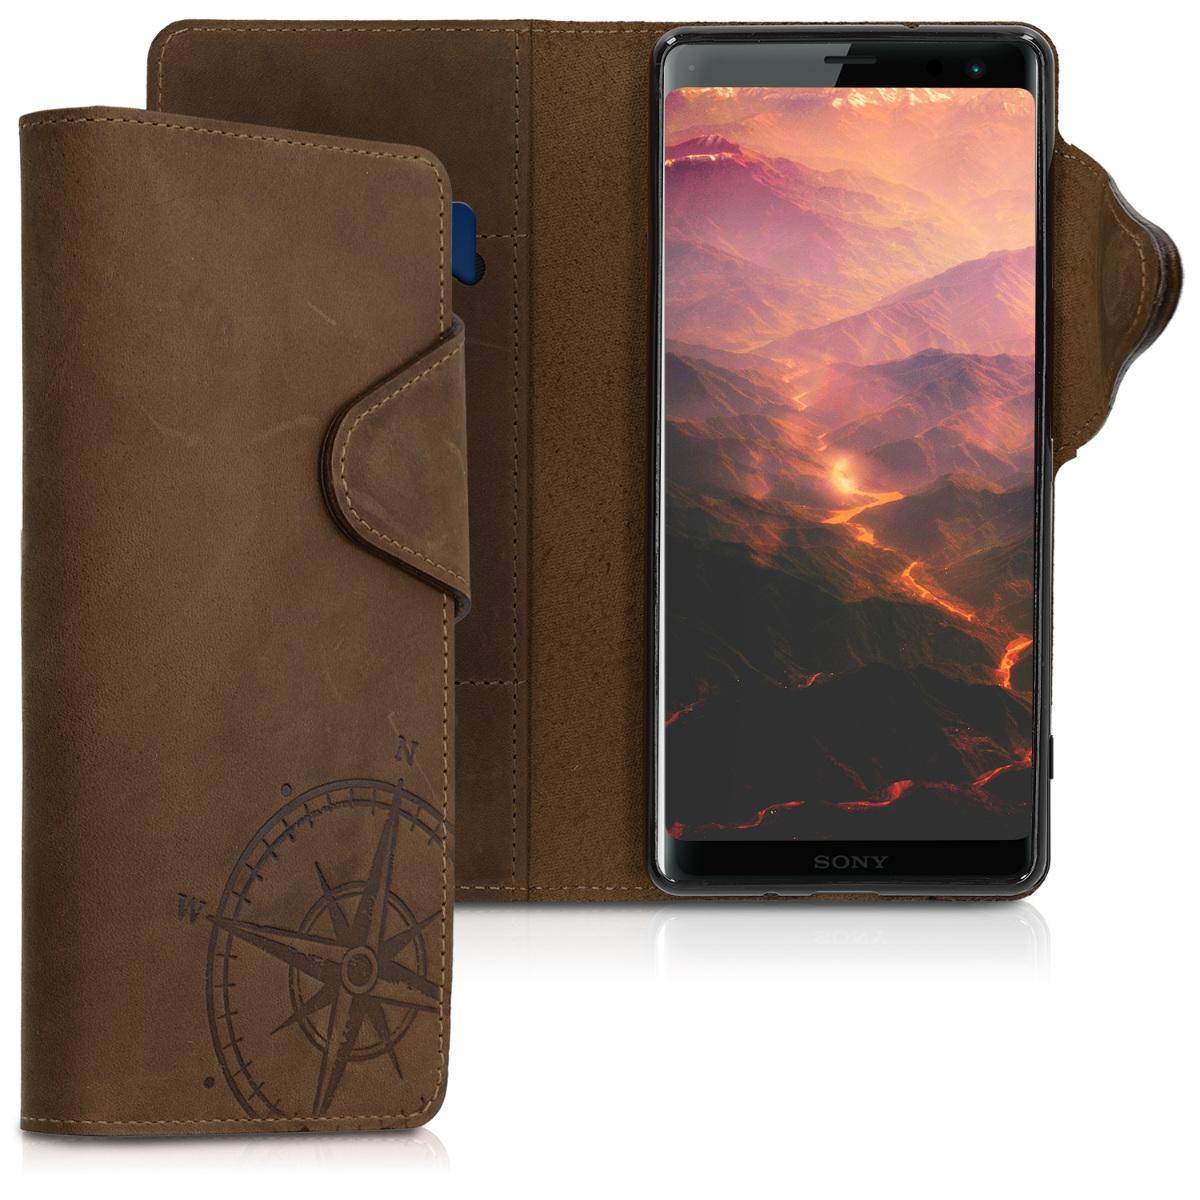 Kalibri Δερμάτινη Suede Θήκη - Πορτοφόλι Sony Xperia XZ3 - Brown Compass (46668.01)